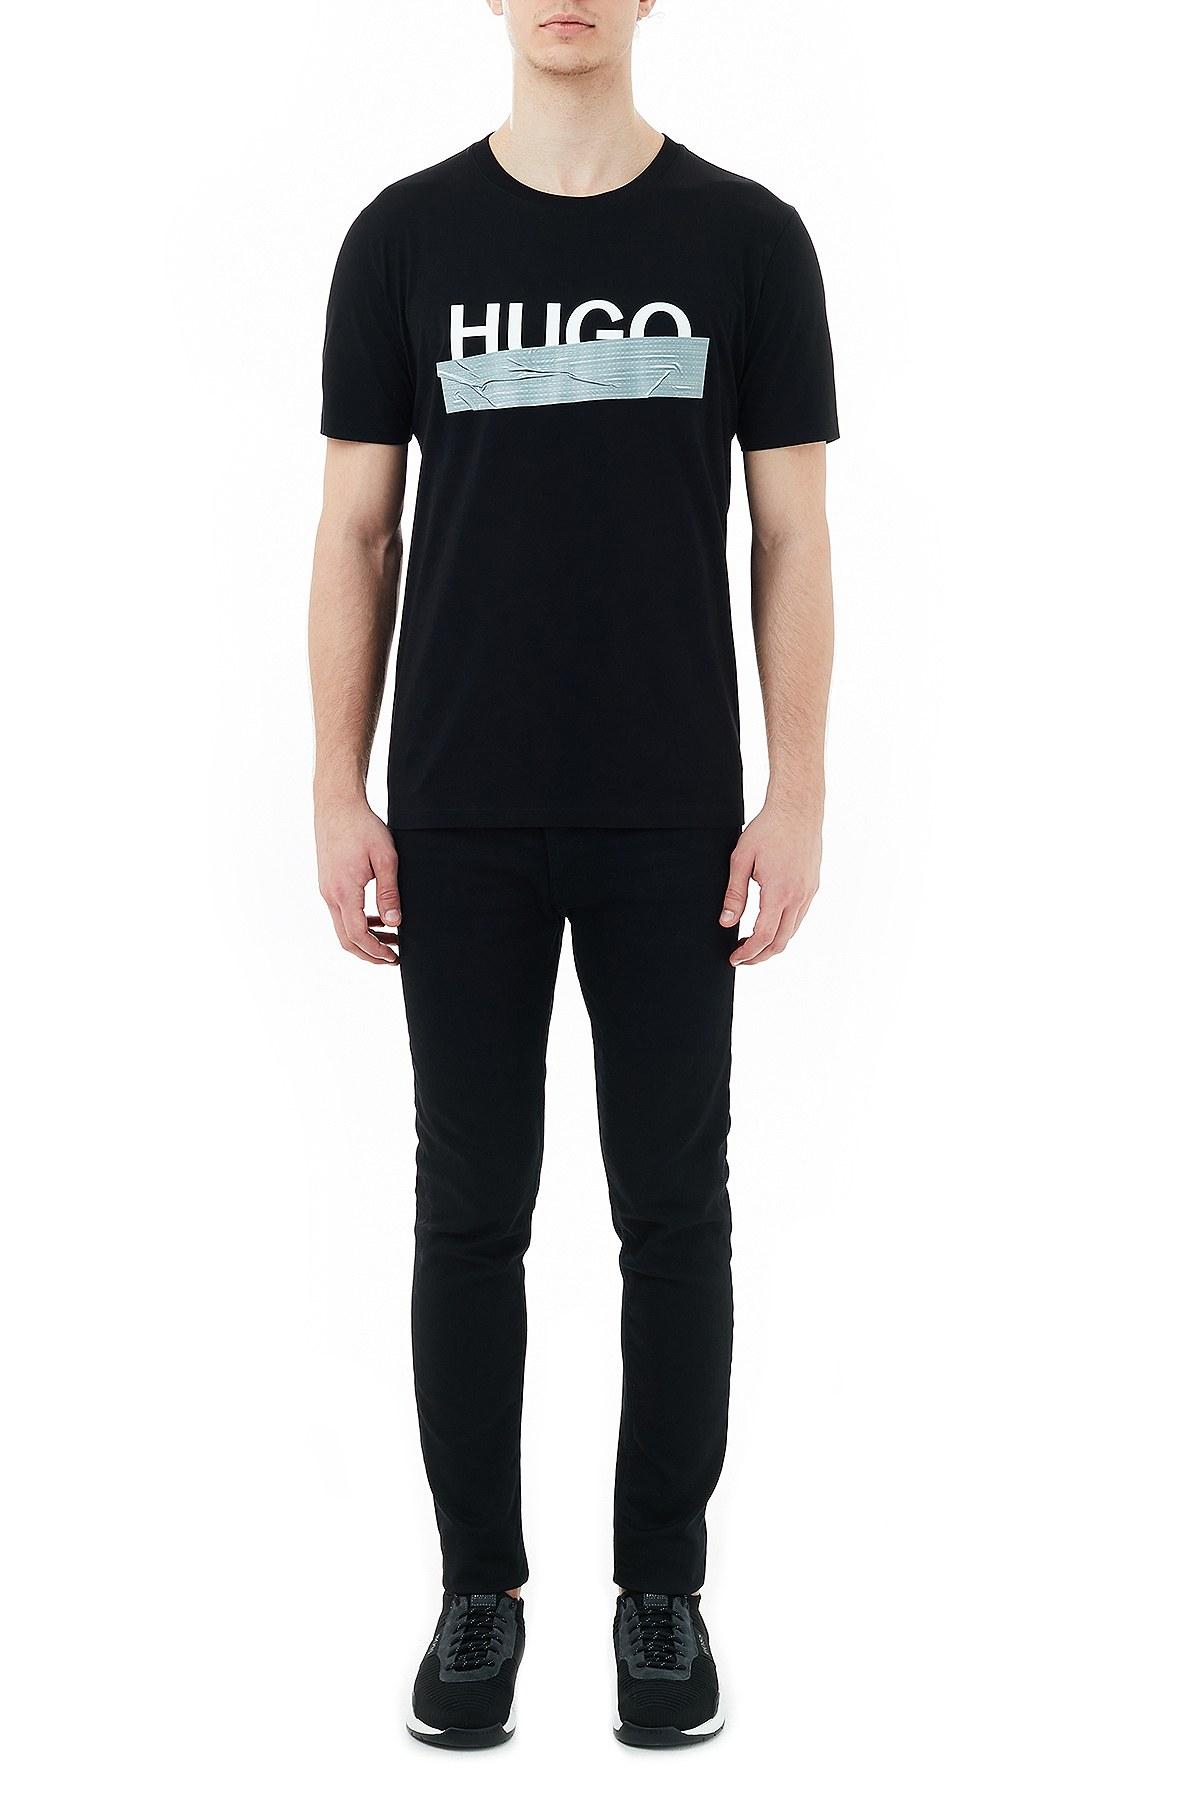 Hugo Boss Regular Fit Baskılı Bisiklet Yaka % 100 Pamuk Erkek T Shirt 50436413 001 SİYAH